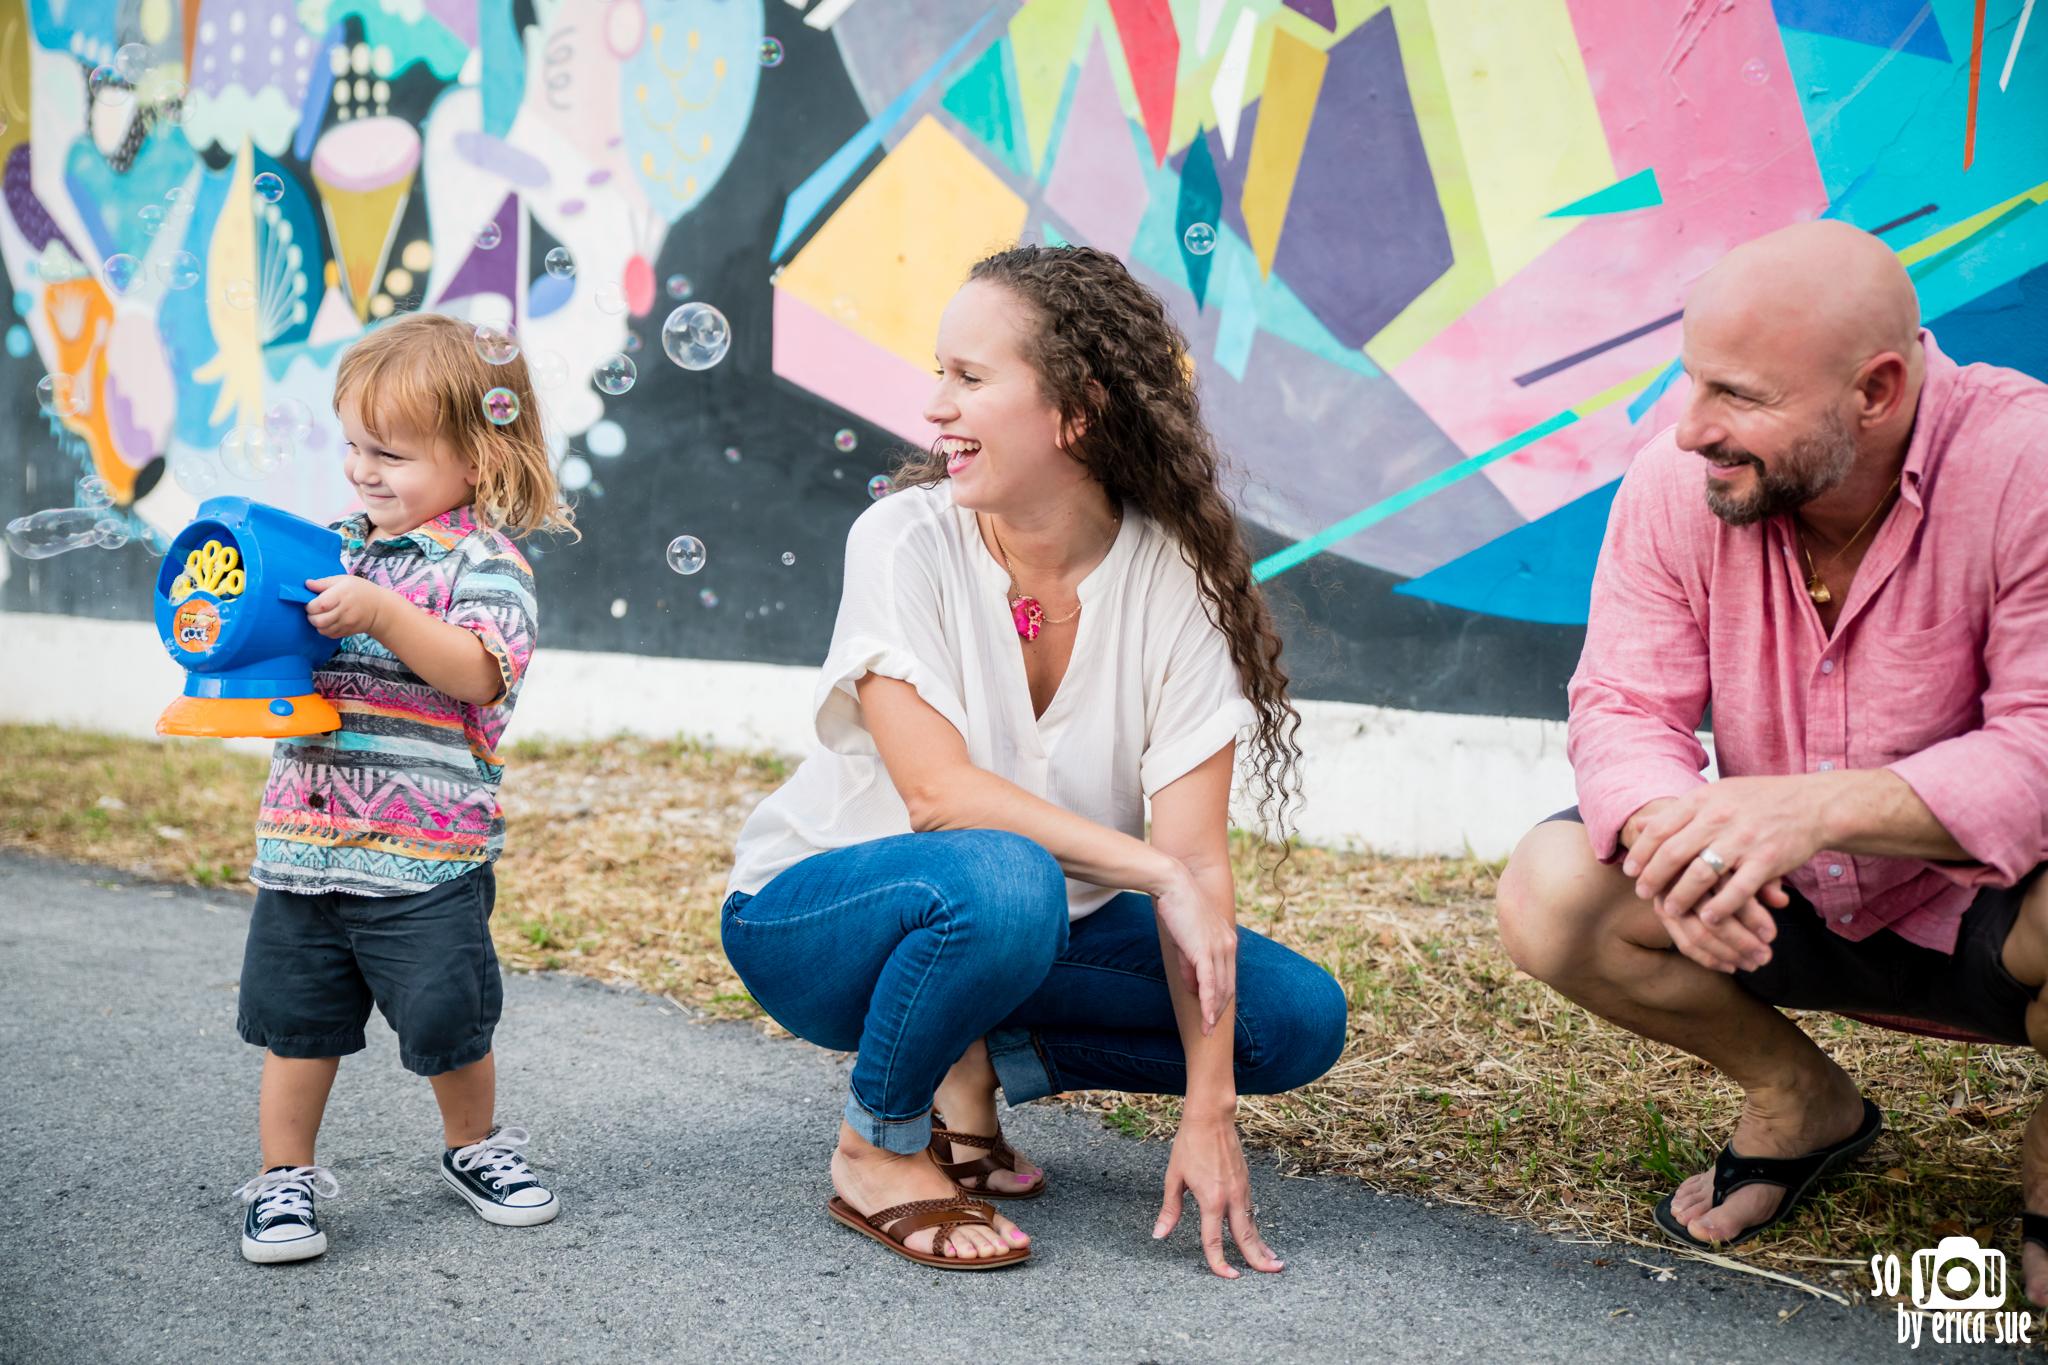 so-you-by-erica-wynwood-photo-shoot-family-photography-miami-7727.jpg